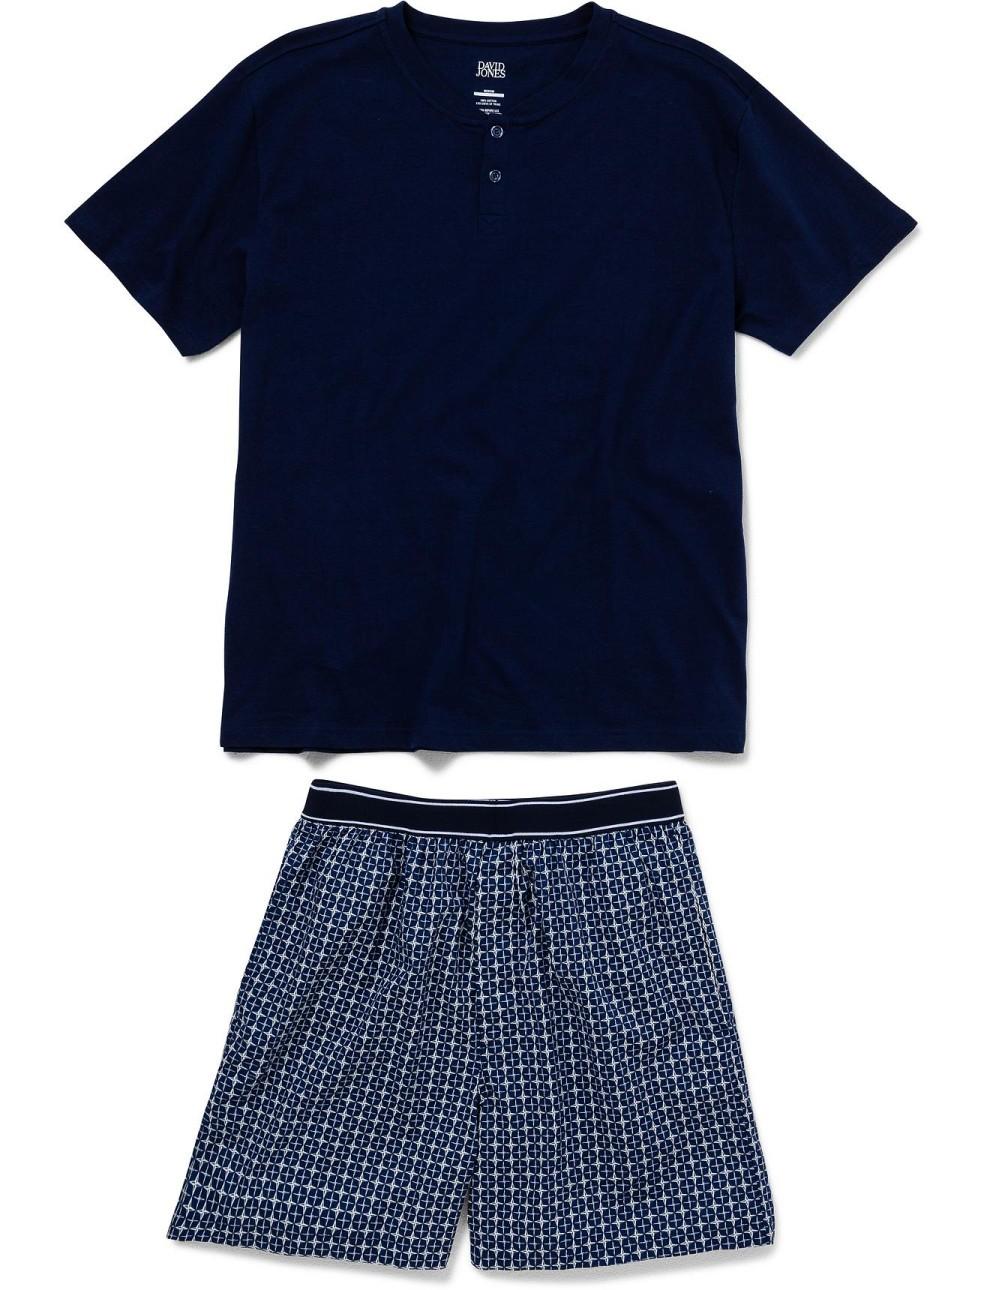 Geometric Print Navy Blue Cotton Nightwear